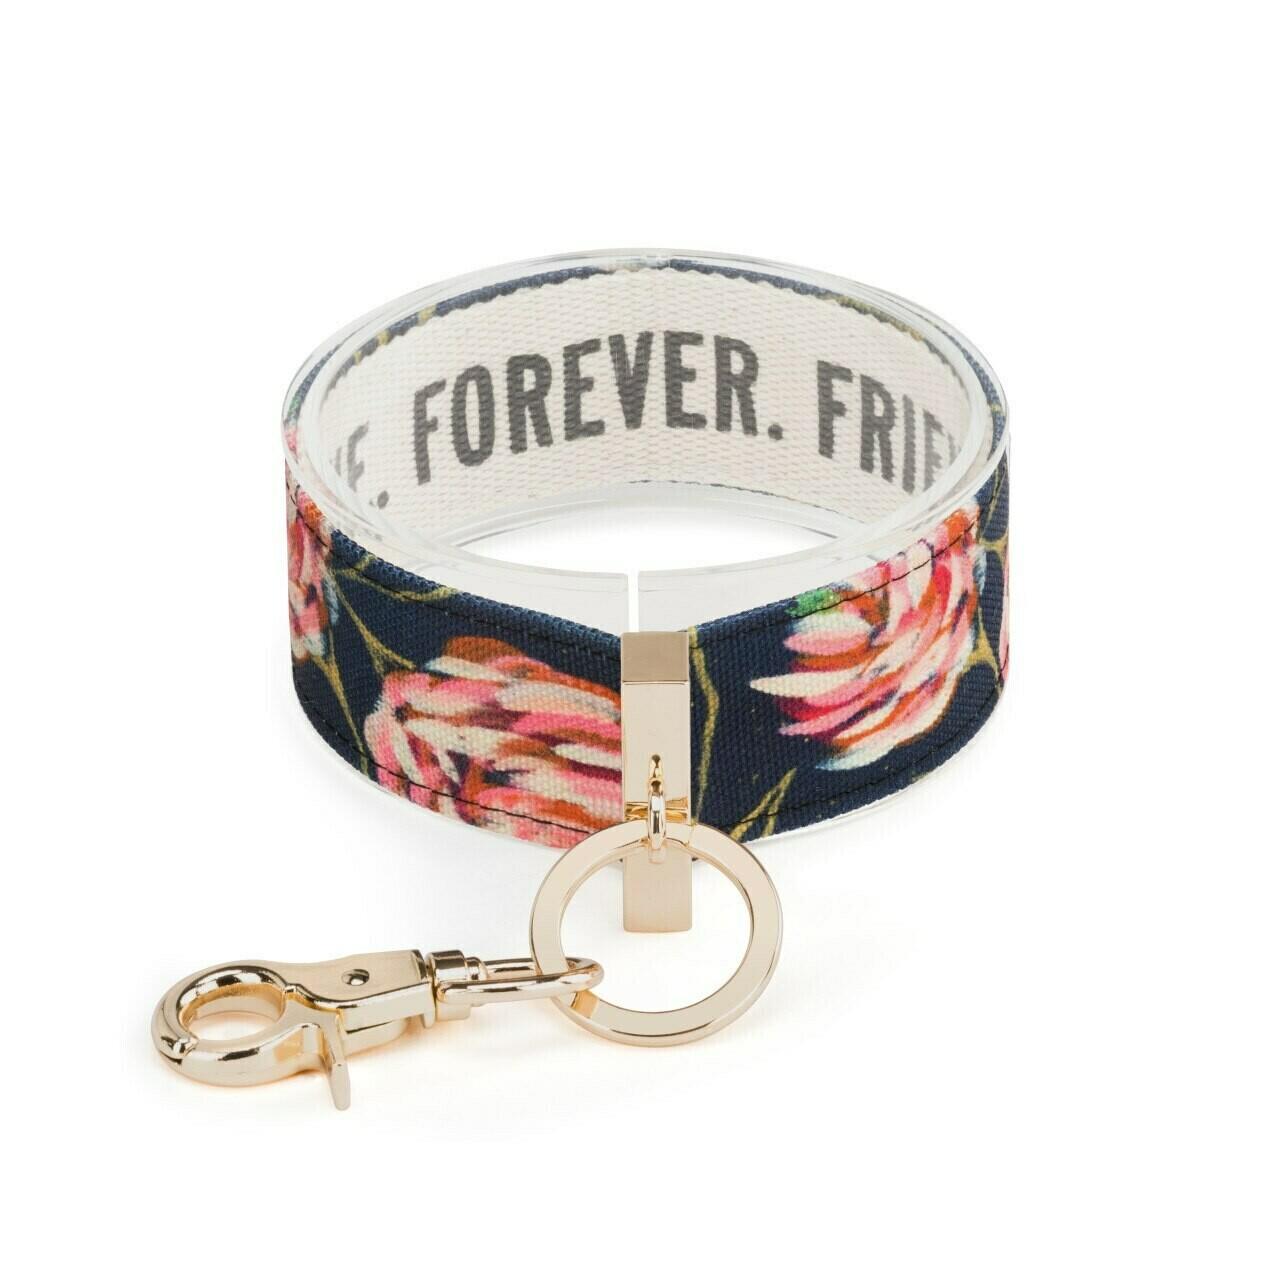 Demdaco Wrist Strap Key Ring TRUE FRIEND FOREVER